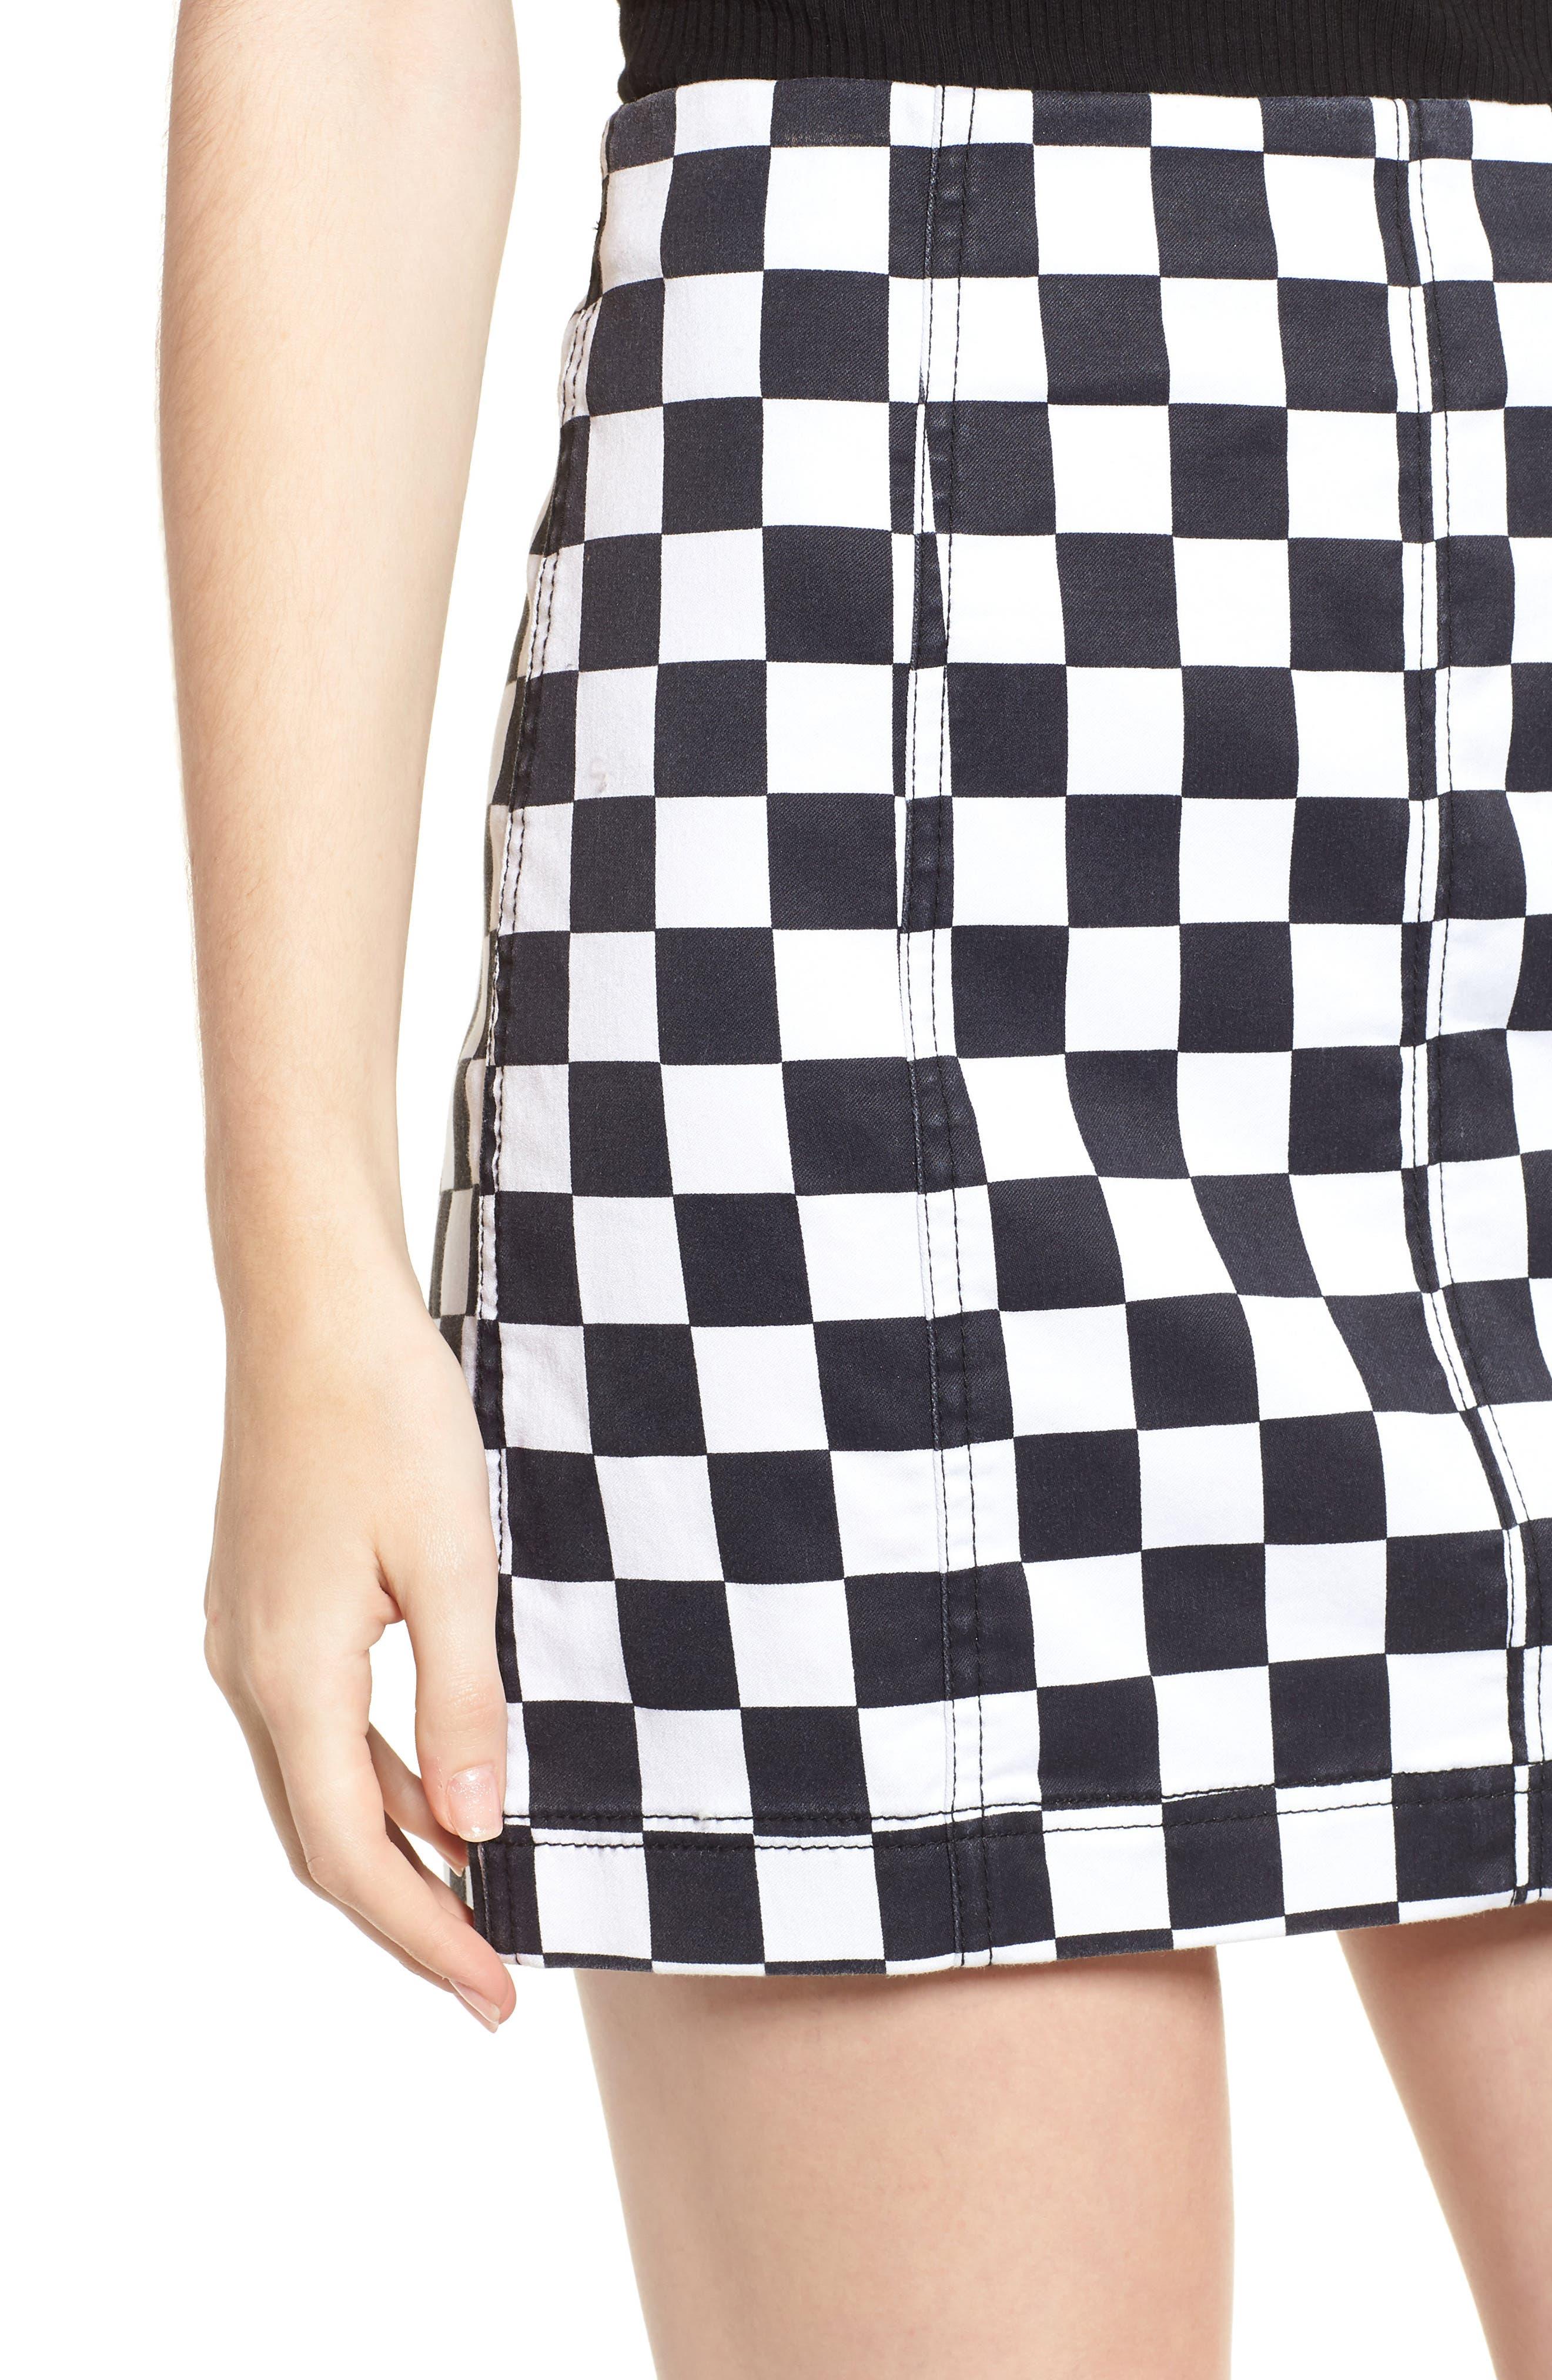 Checkered Denim Miniskirt,                             Alternate thumbnail 4, color,                             BLACK/ WHITE CHECKERED